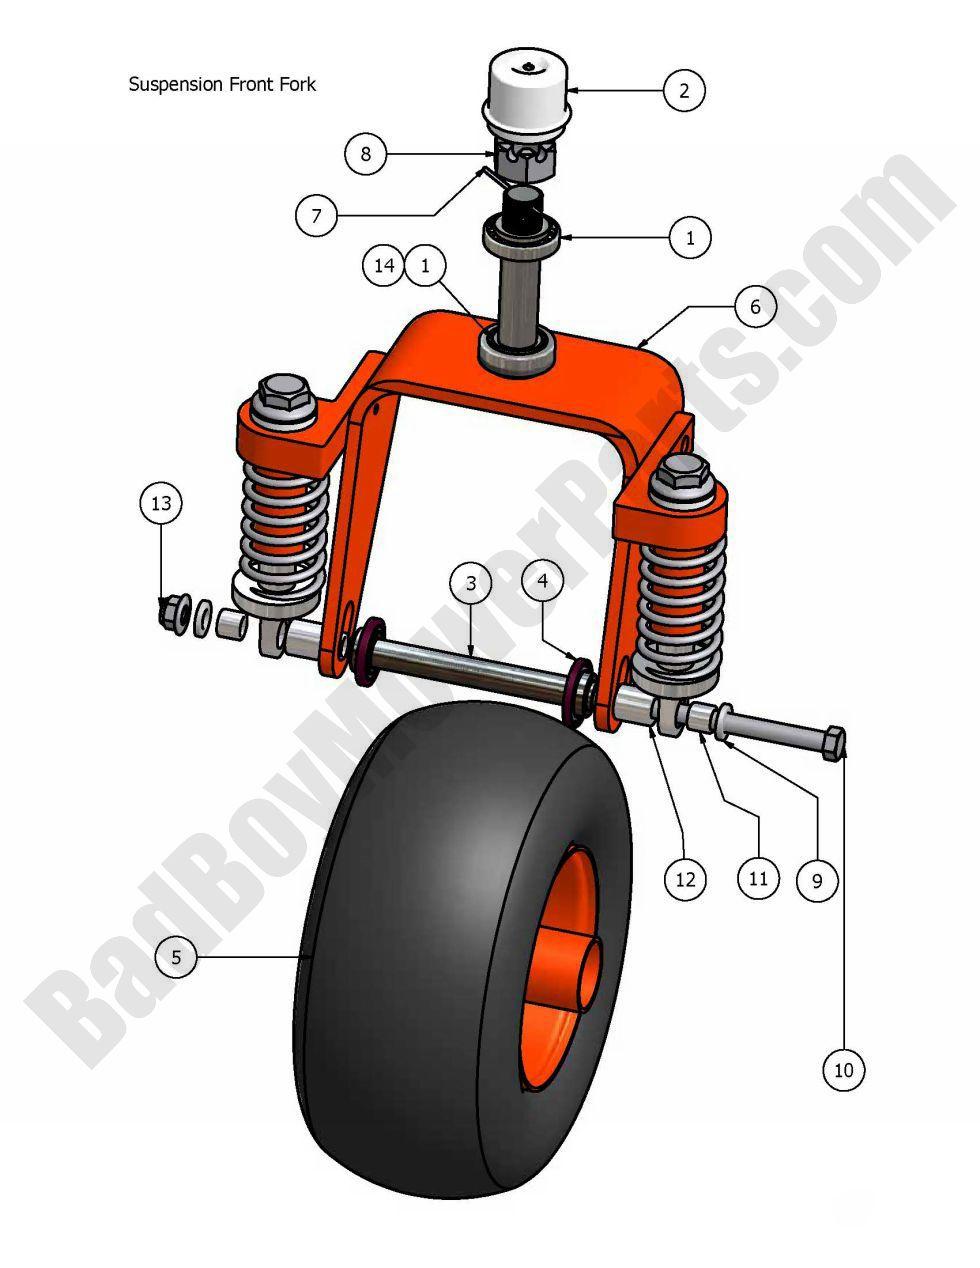 bad boy parts lookup 2007 aos suspension front fork Huskee Garden Tractor Model 808K MTD Huskee Lawn Tractor Manual